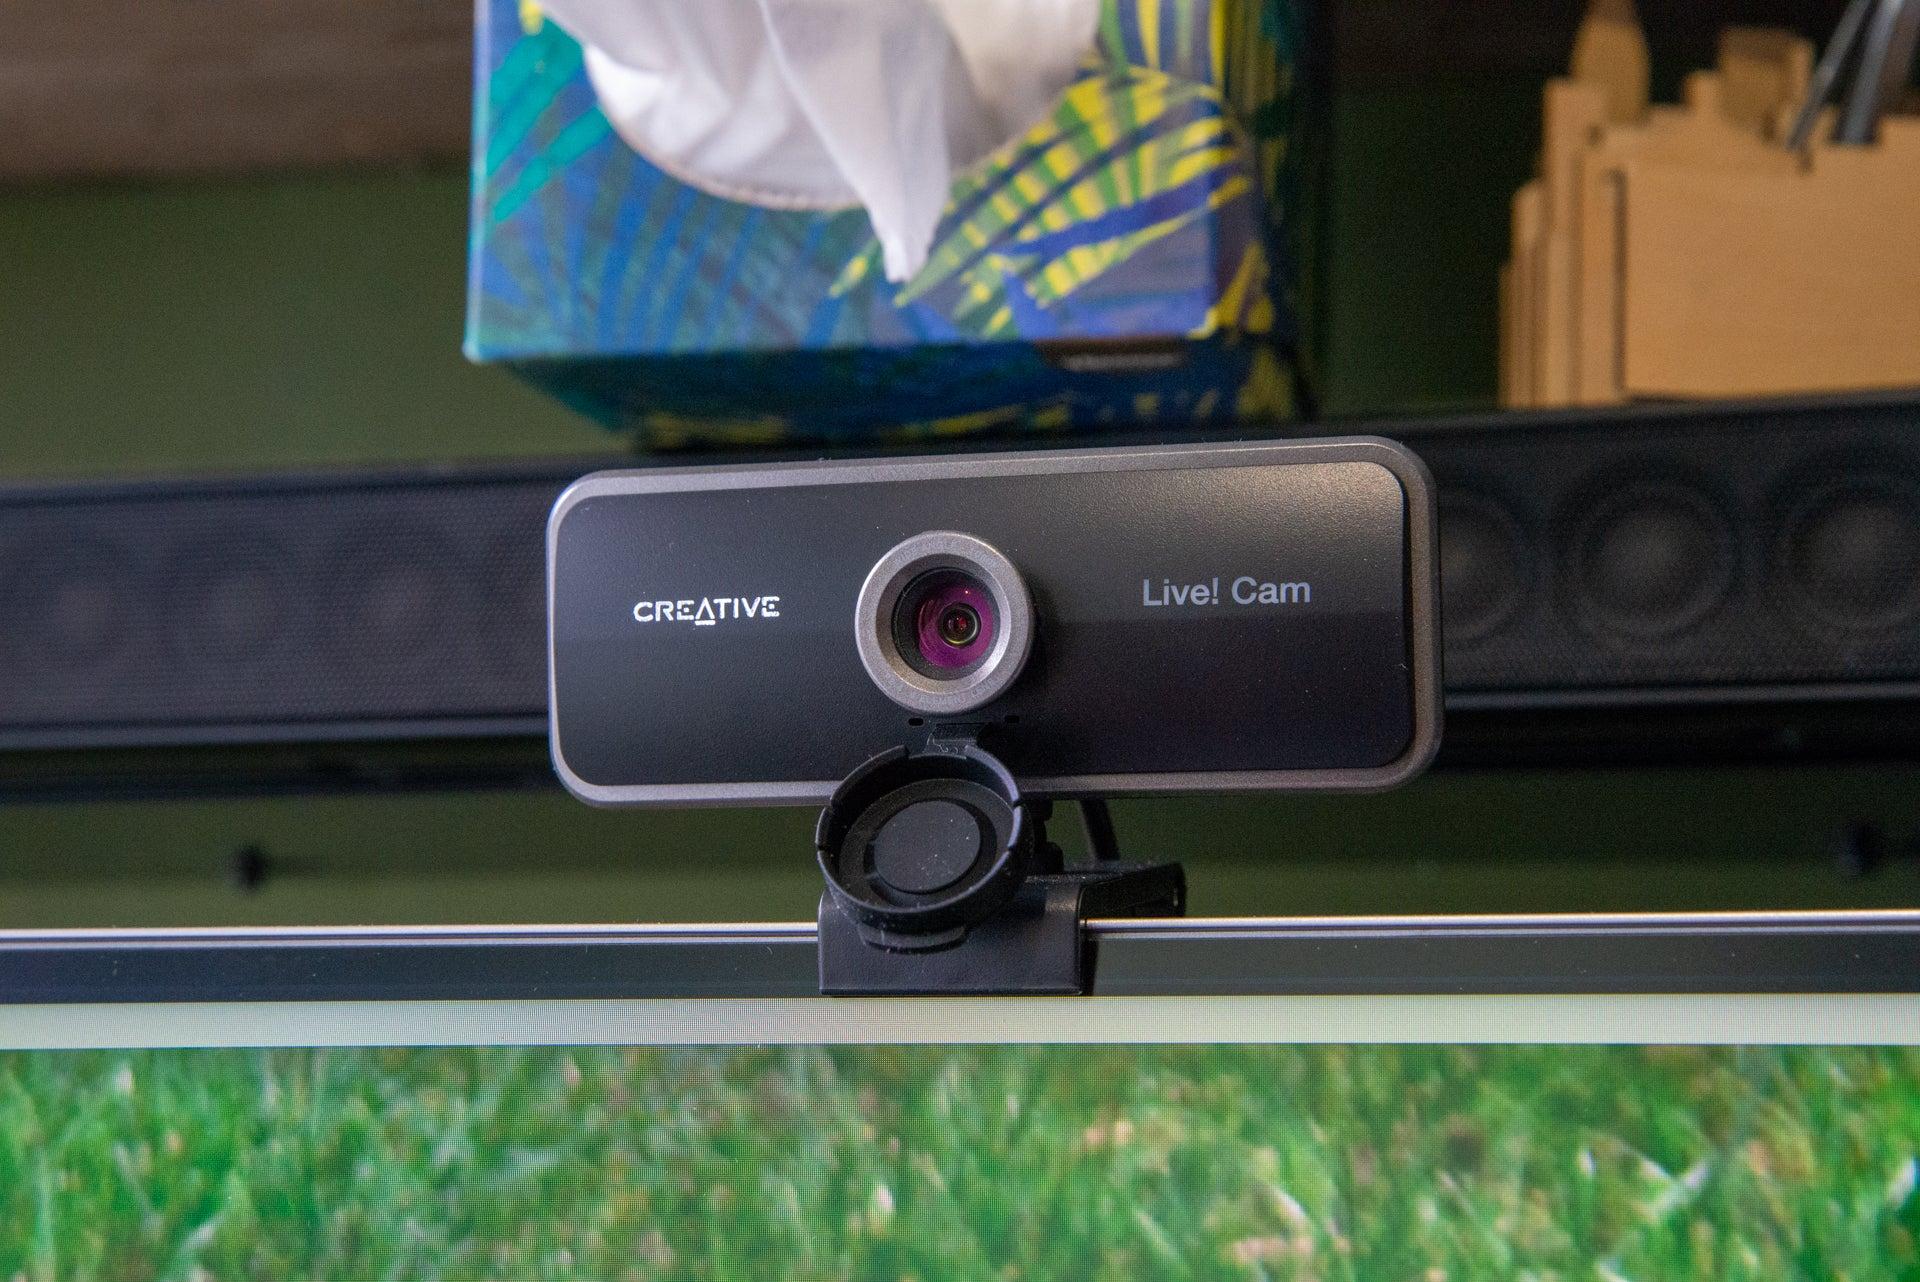 Creative Live! Cam Sync 1080p side